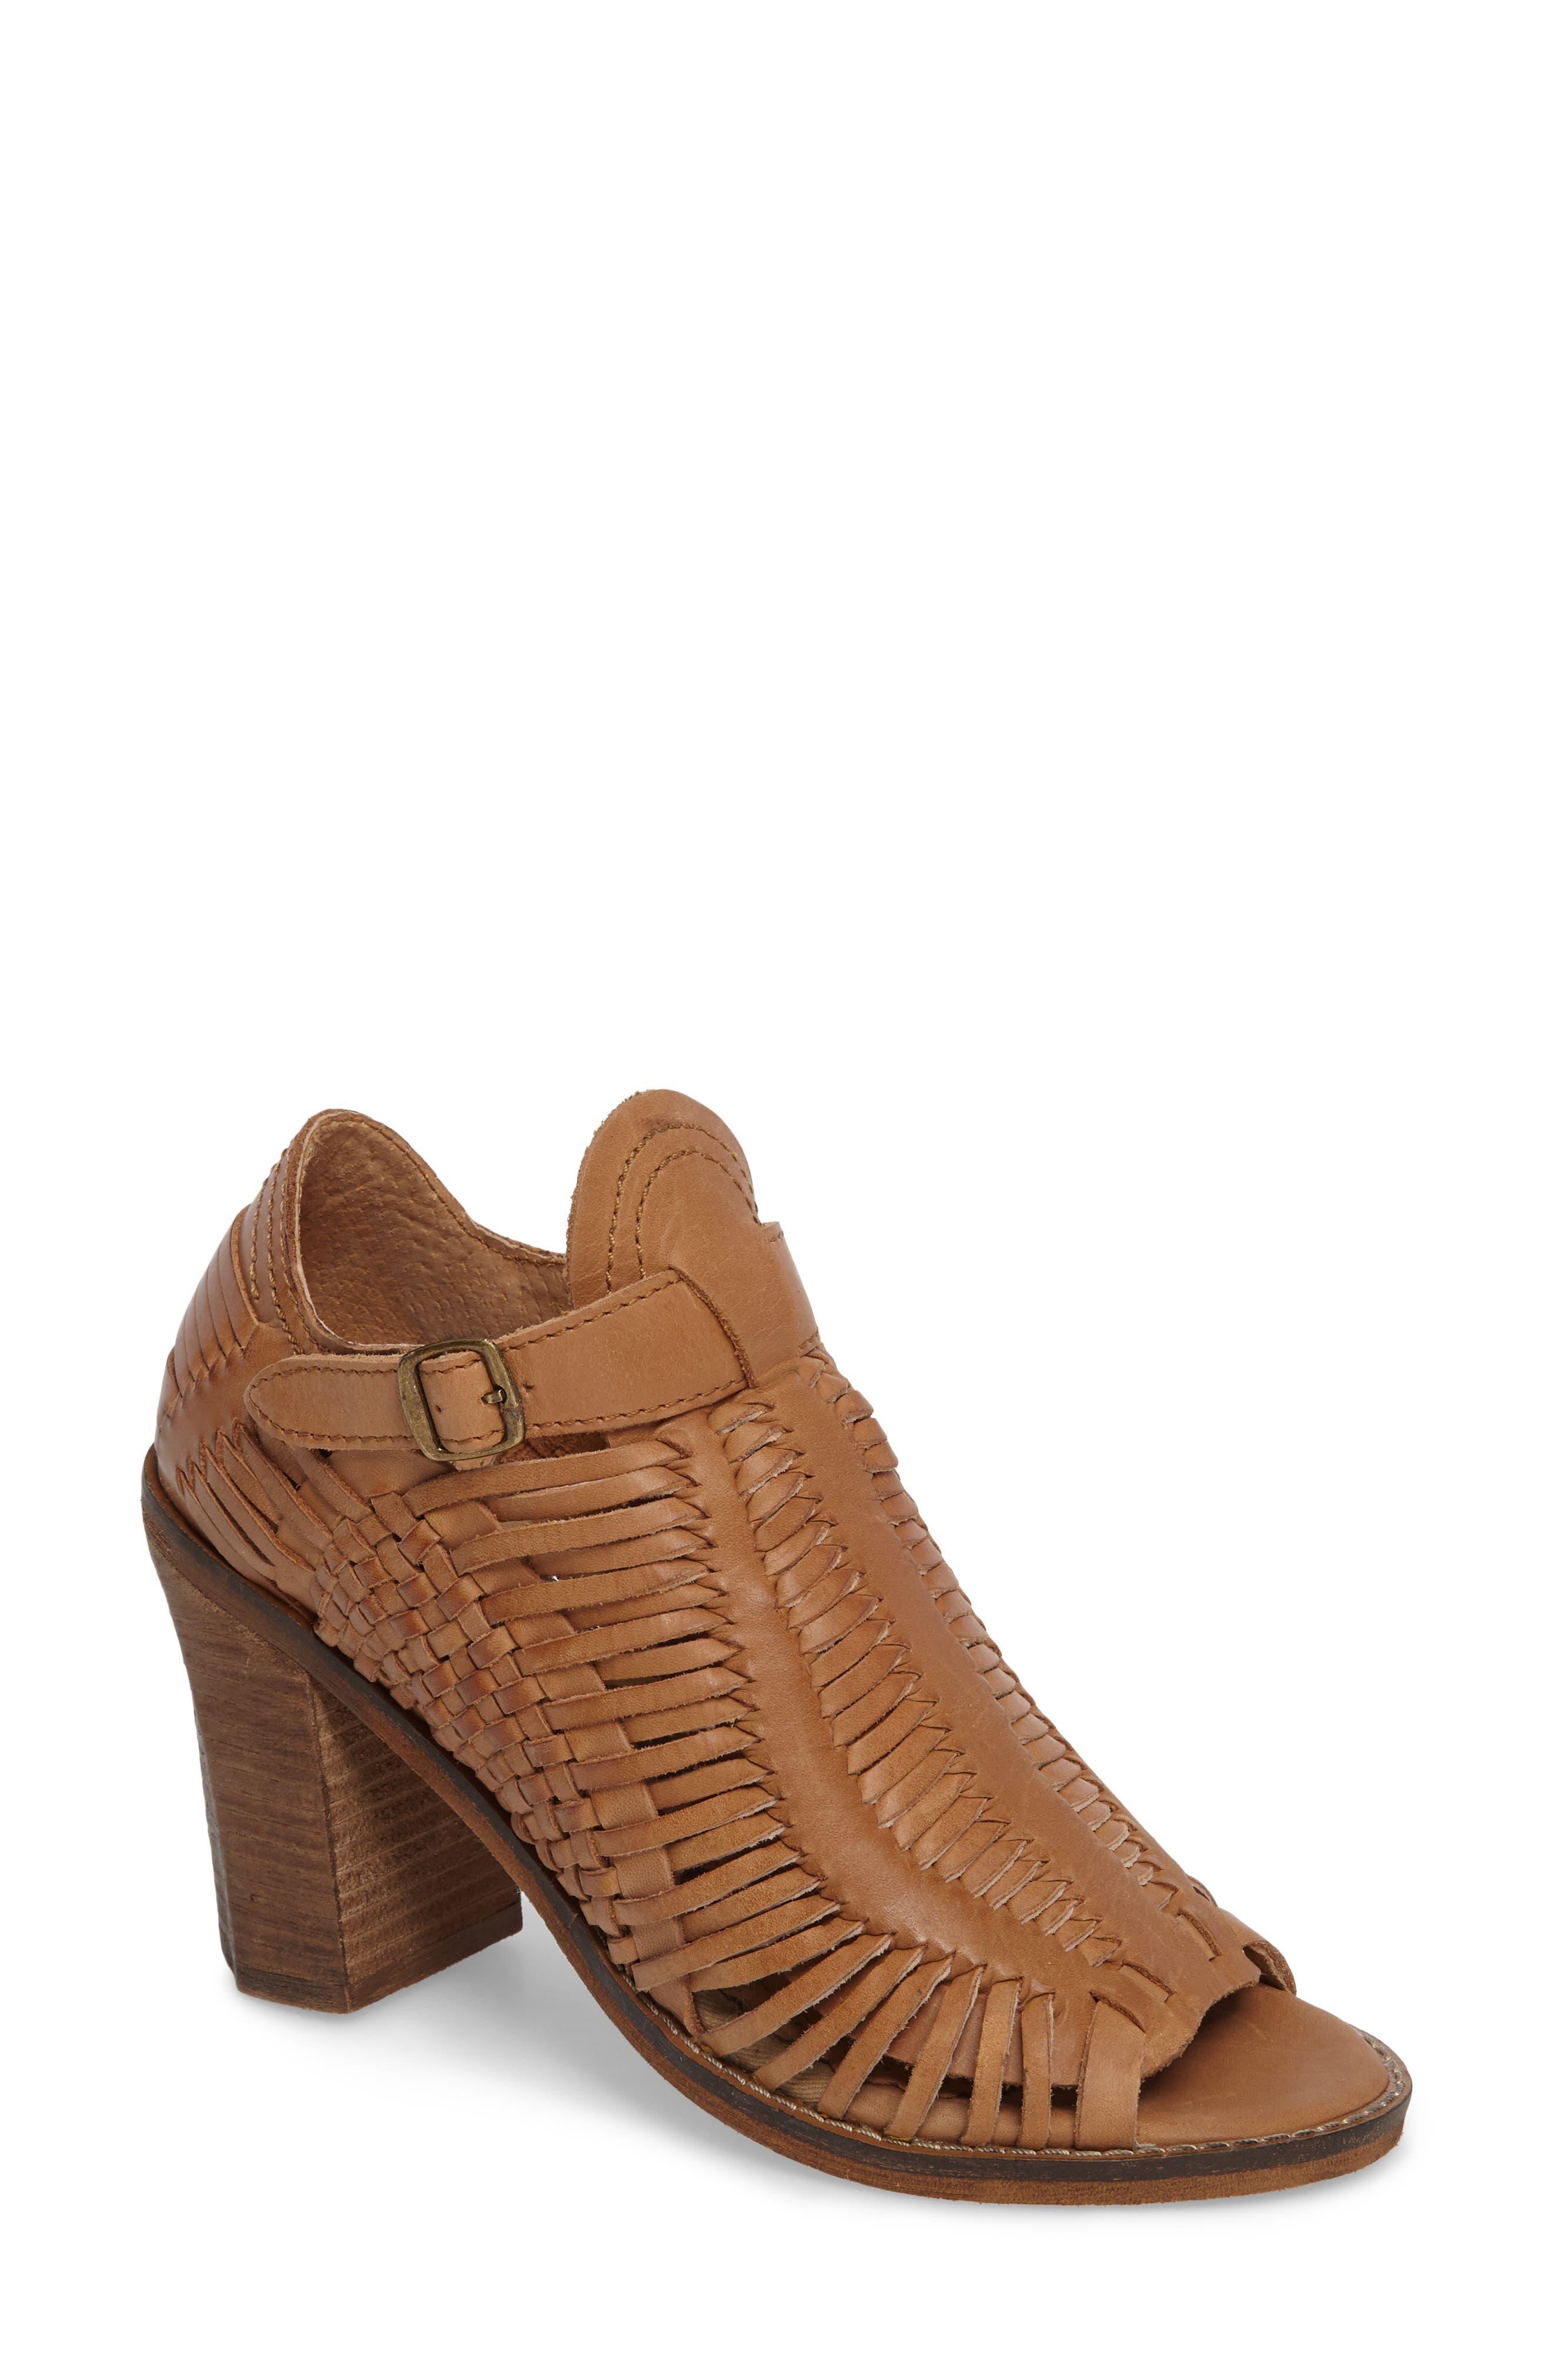 Killion Open Toe Bootie,                         Main,                         color, Tan Leather